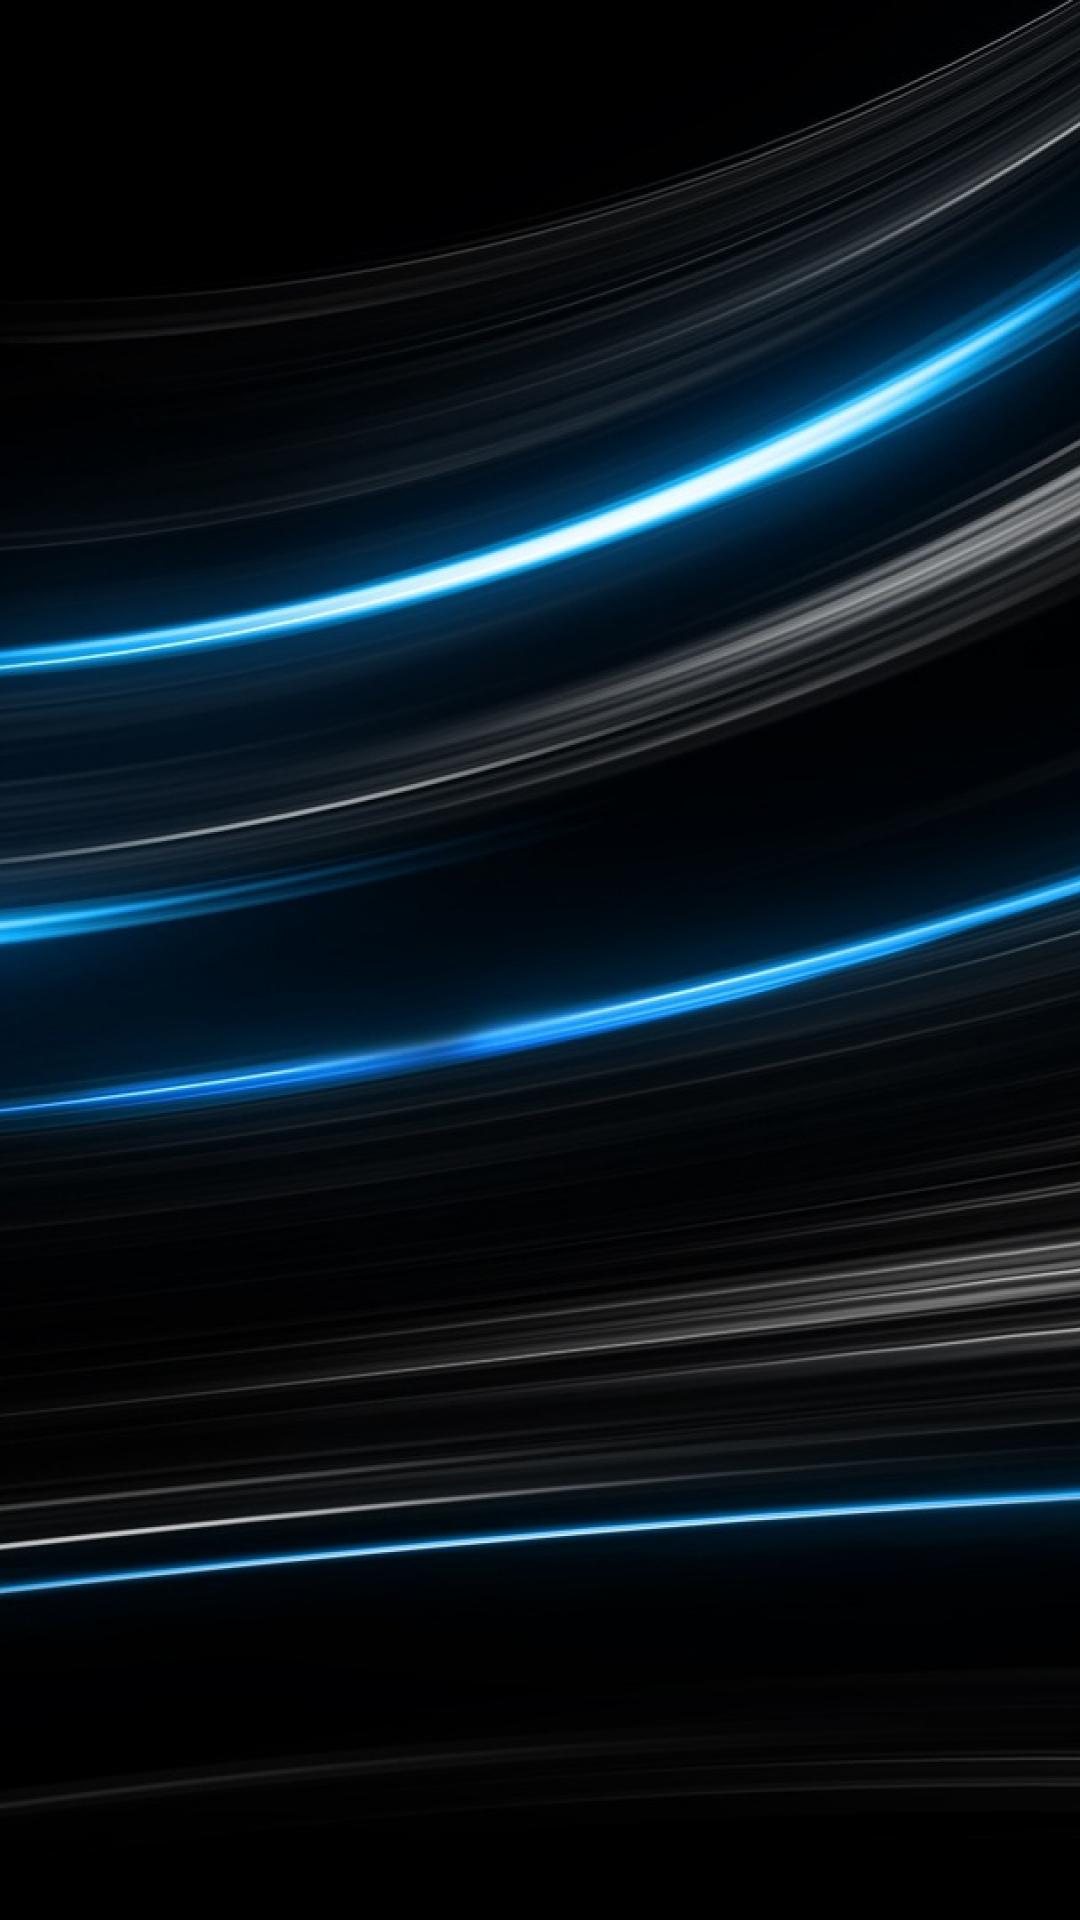 wallpaper black blue lines - photo #21